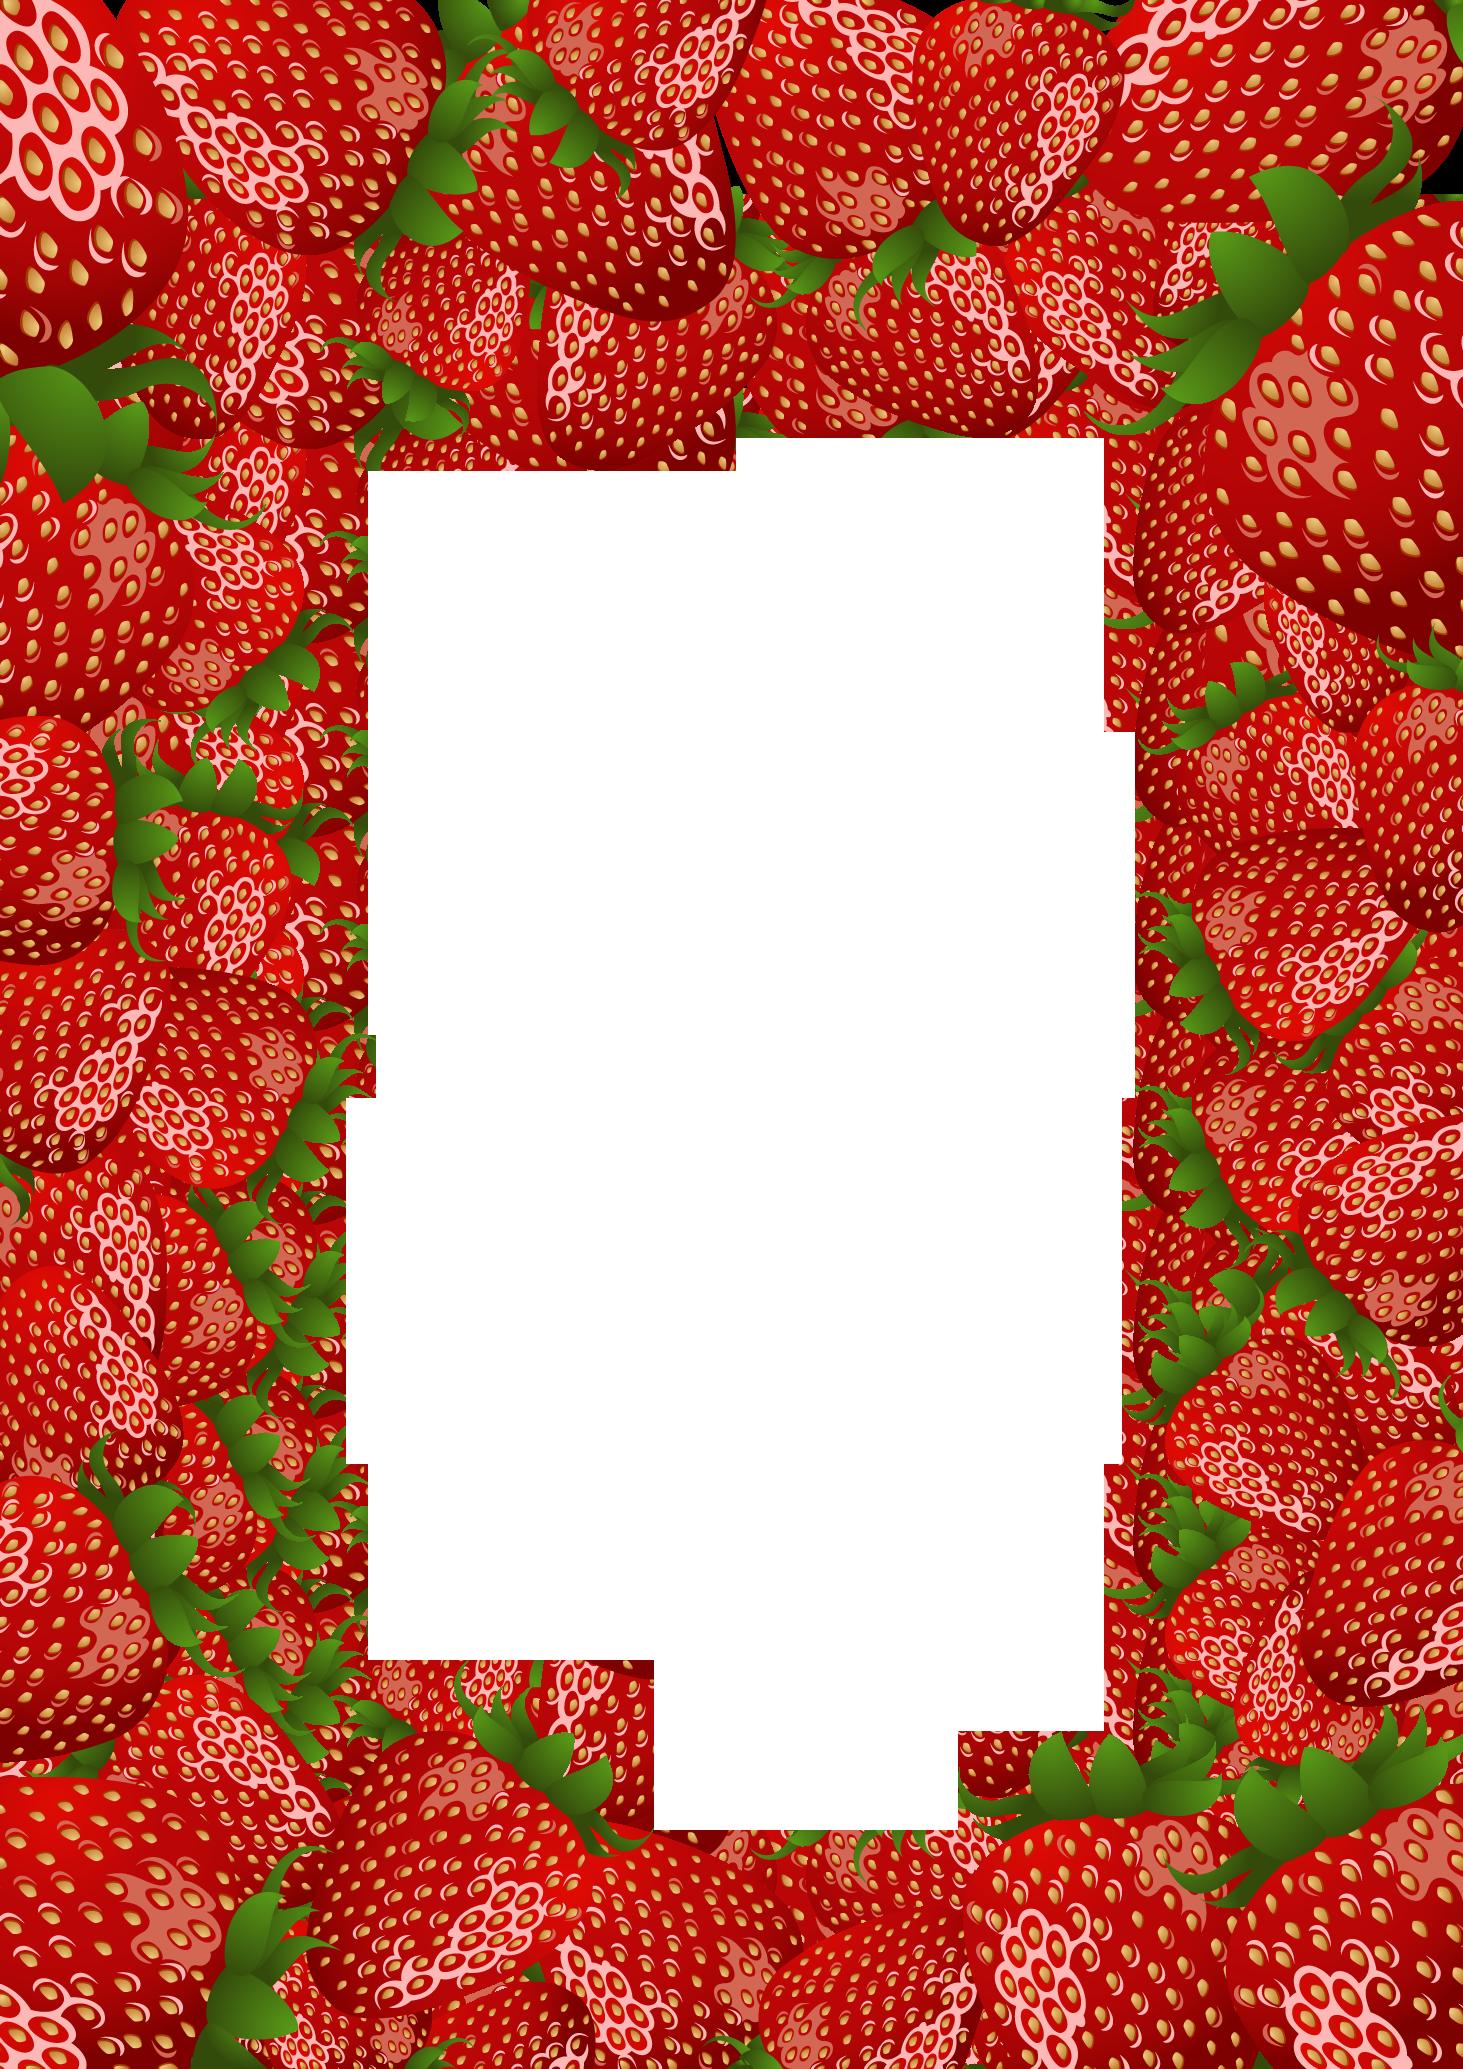 Heart shaped strawberry clipart vector Strawberry Frame by flashtuchka on DeviantArt vector